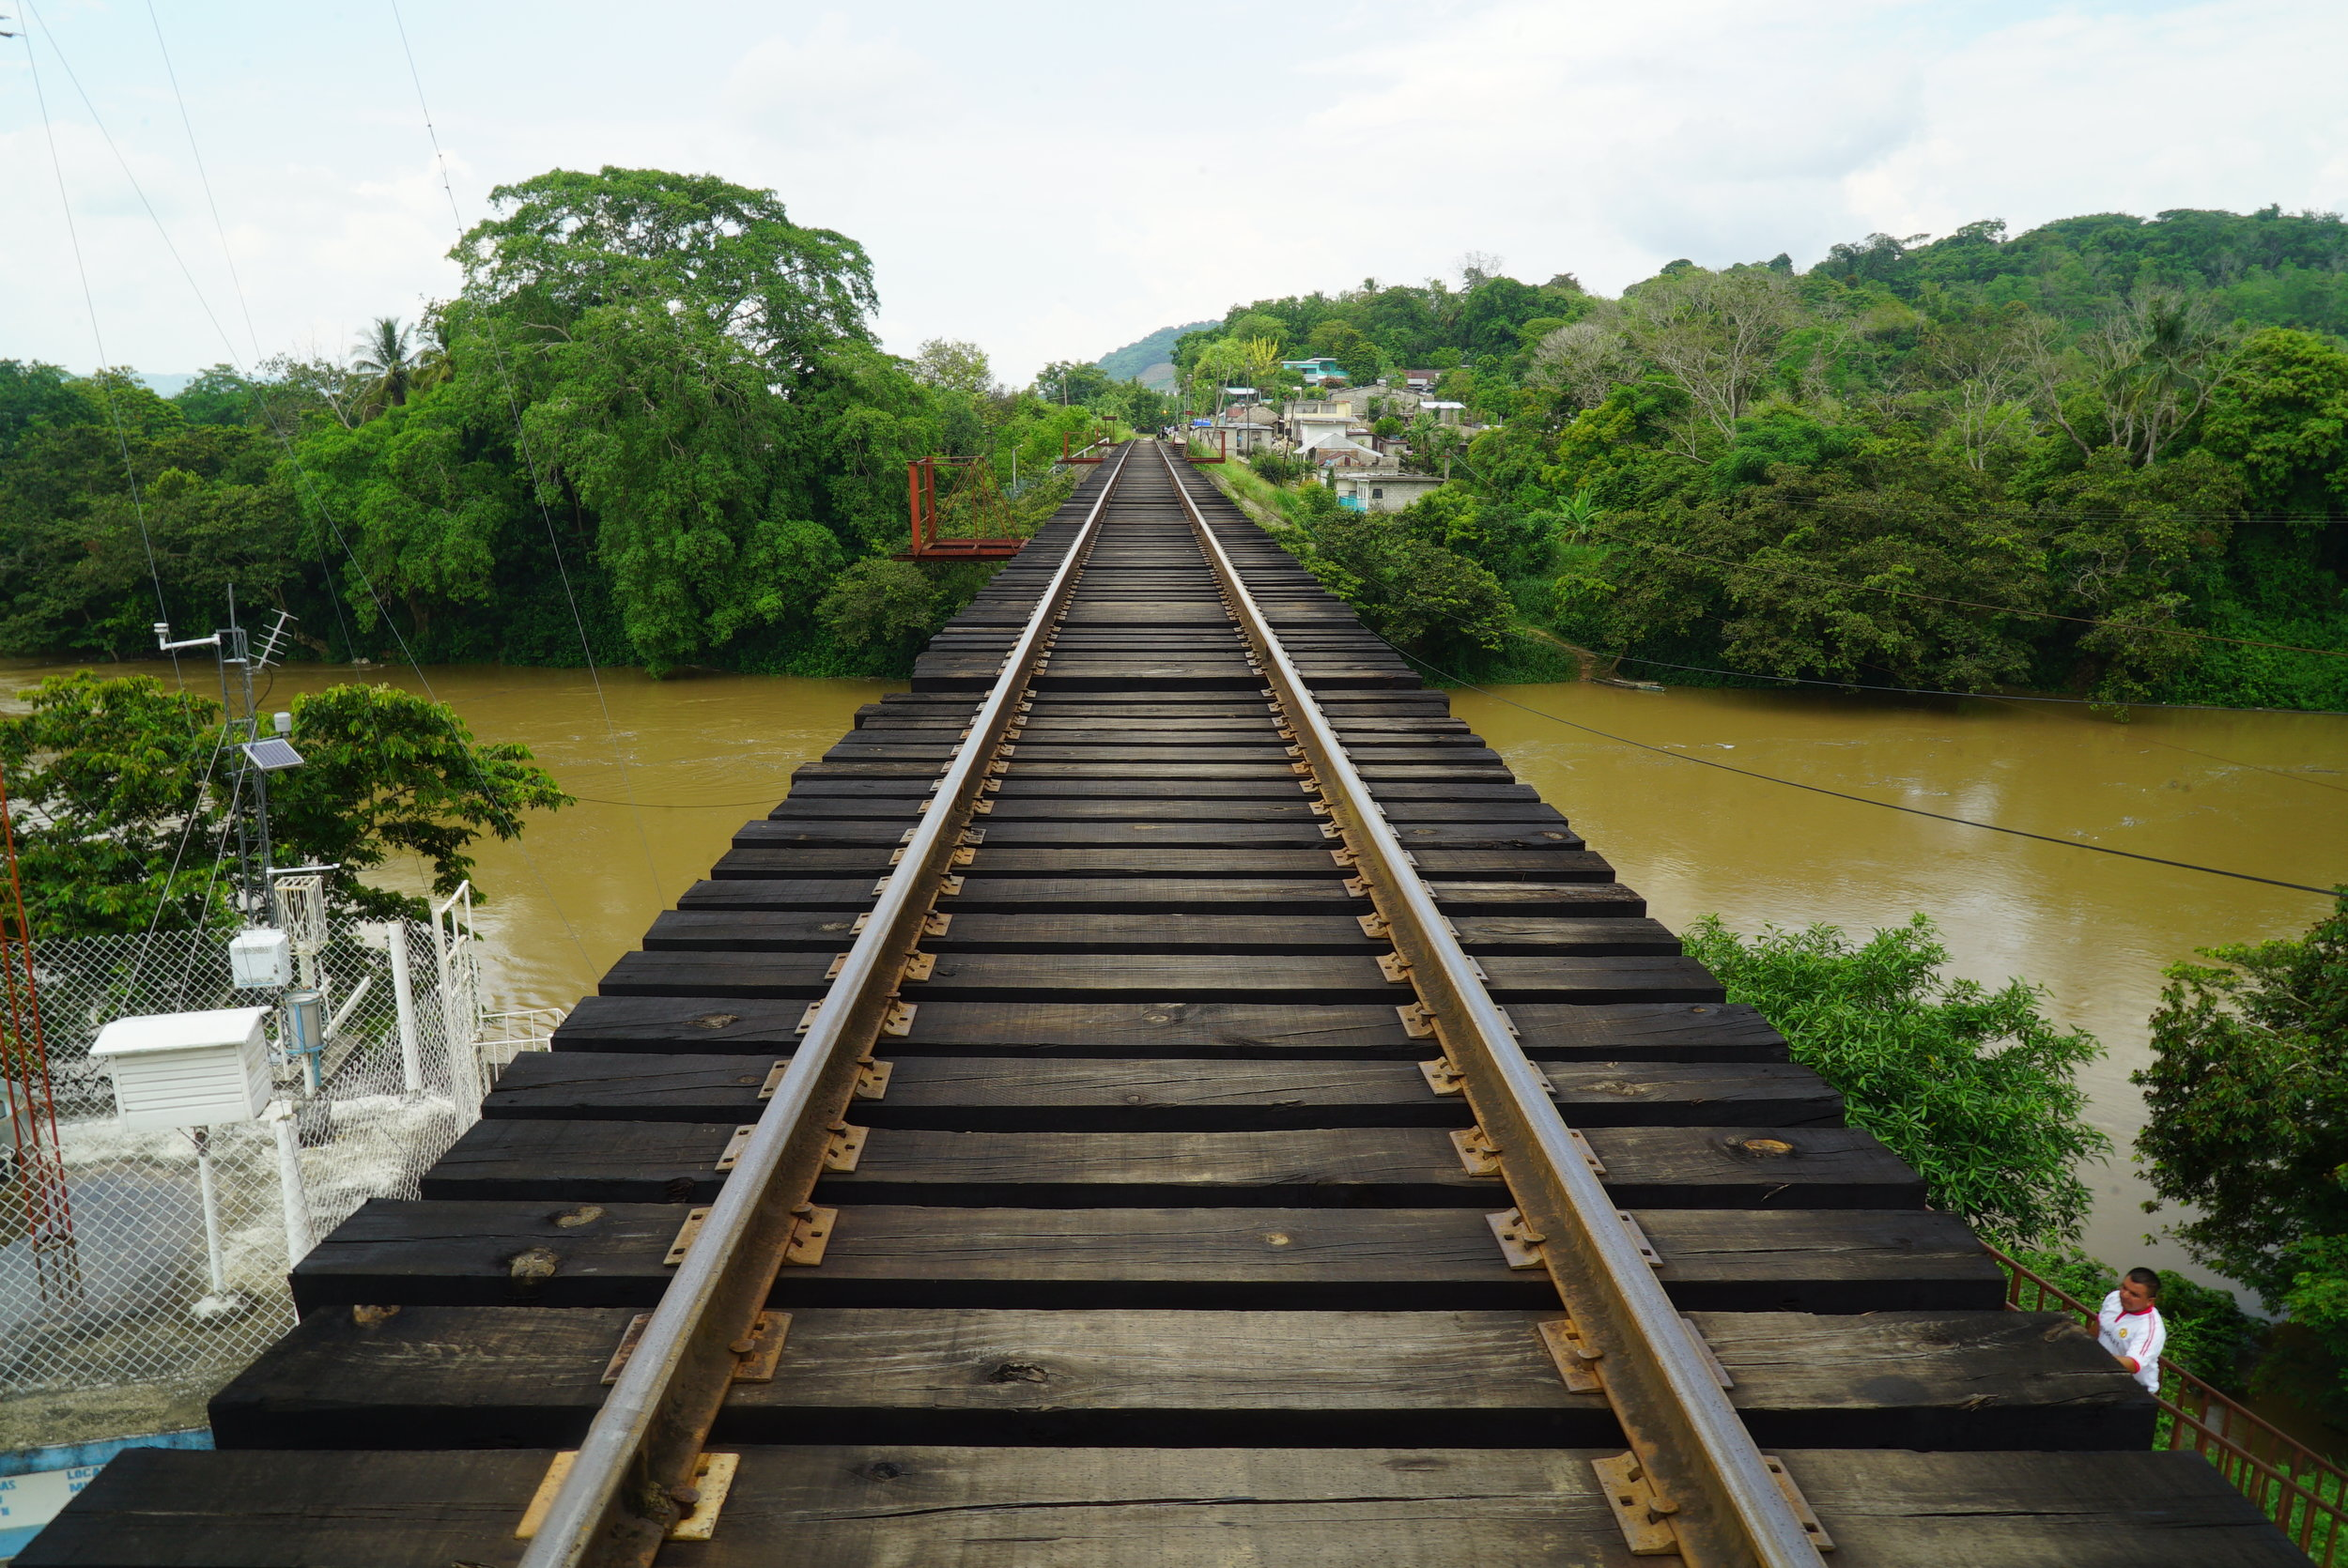 Train tracks at Salto de Agua, Mexico. Near the border with Guatemala.Photo Credit: Irvin Mondragón